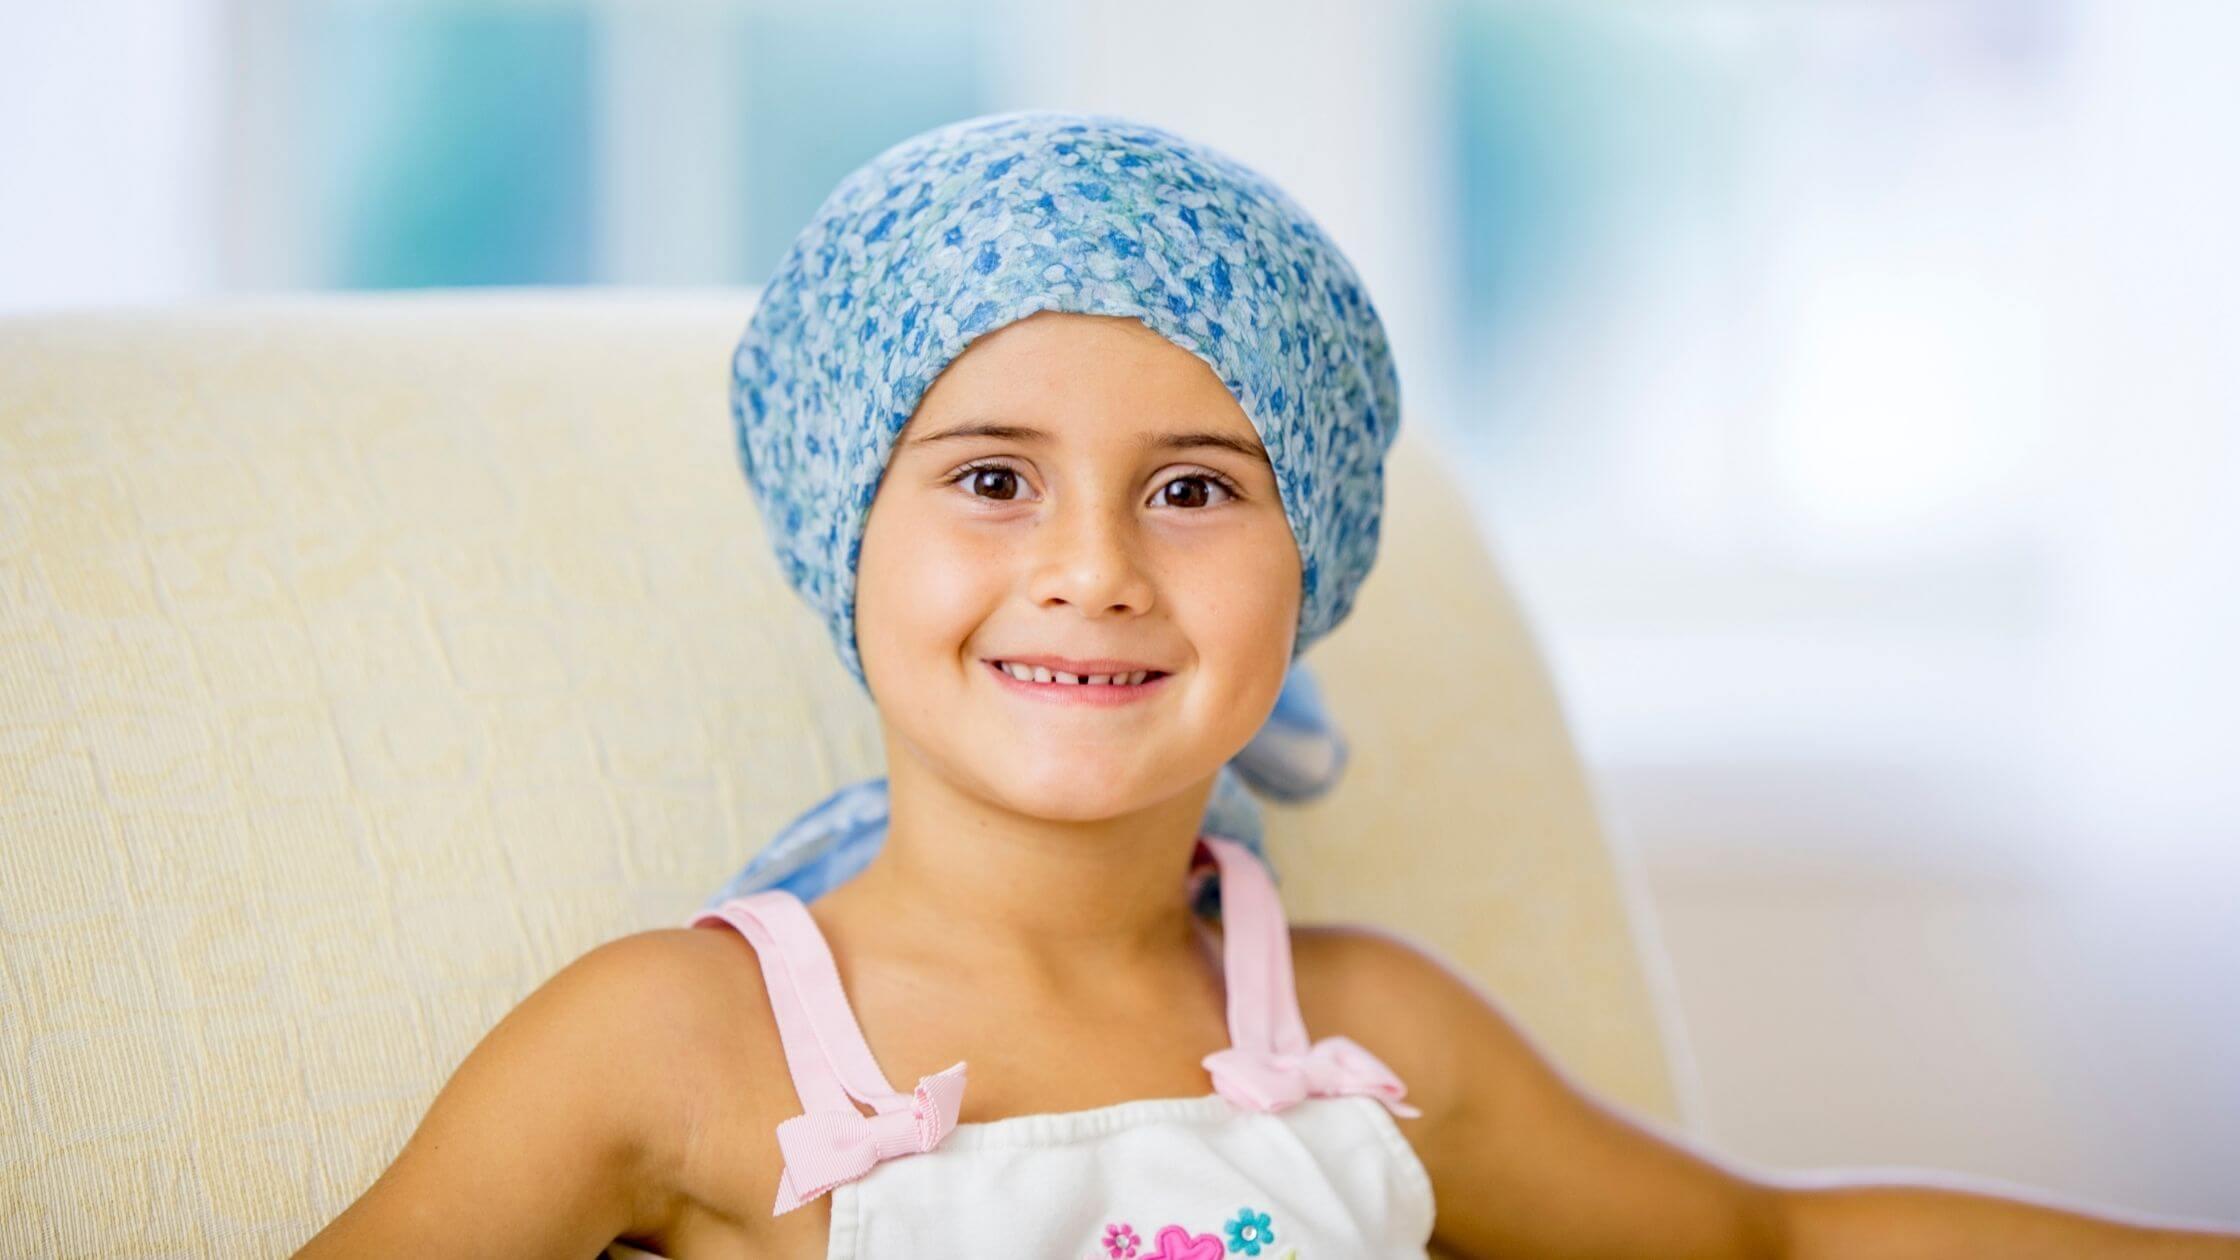 Gorros oncológicos para verano